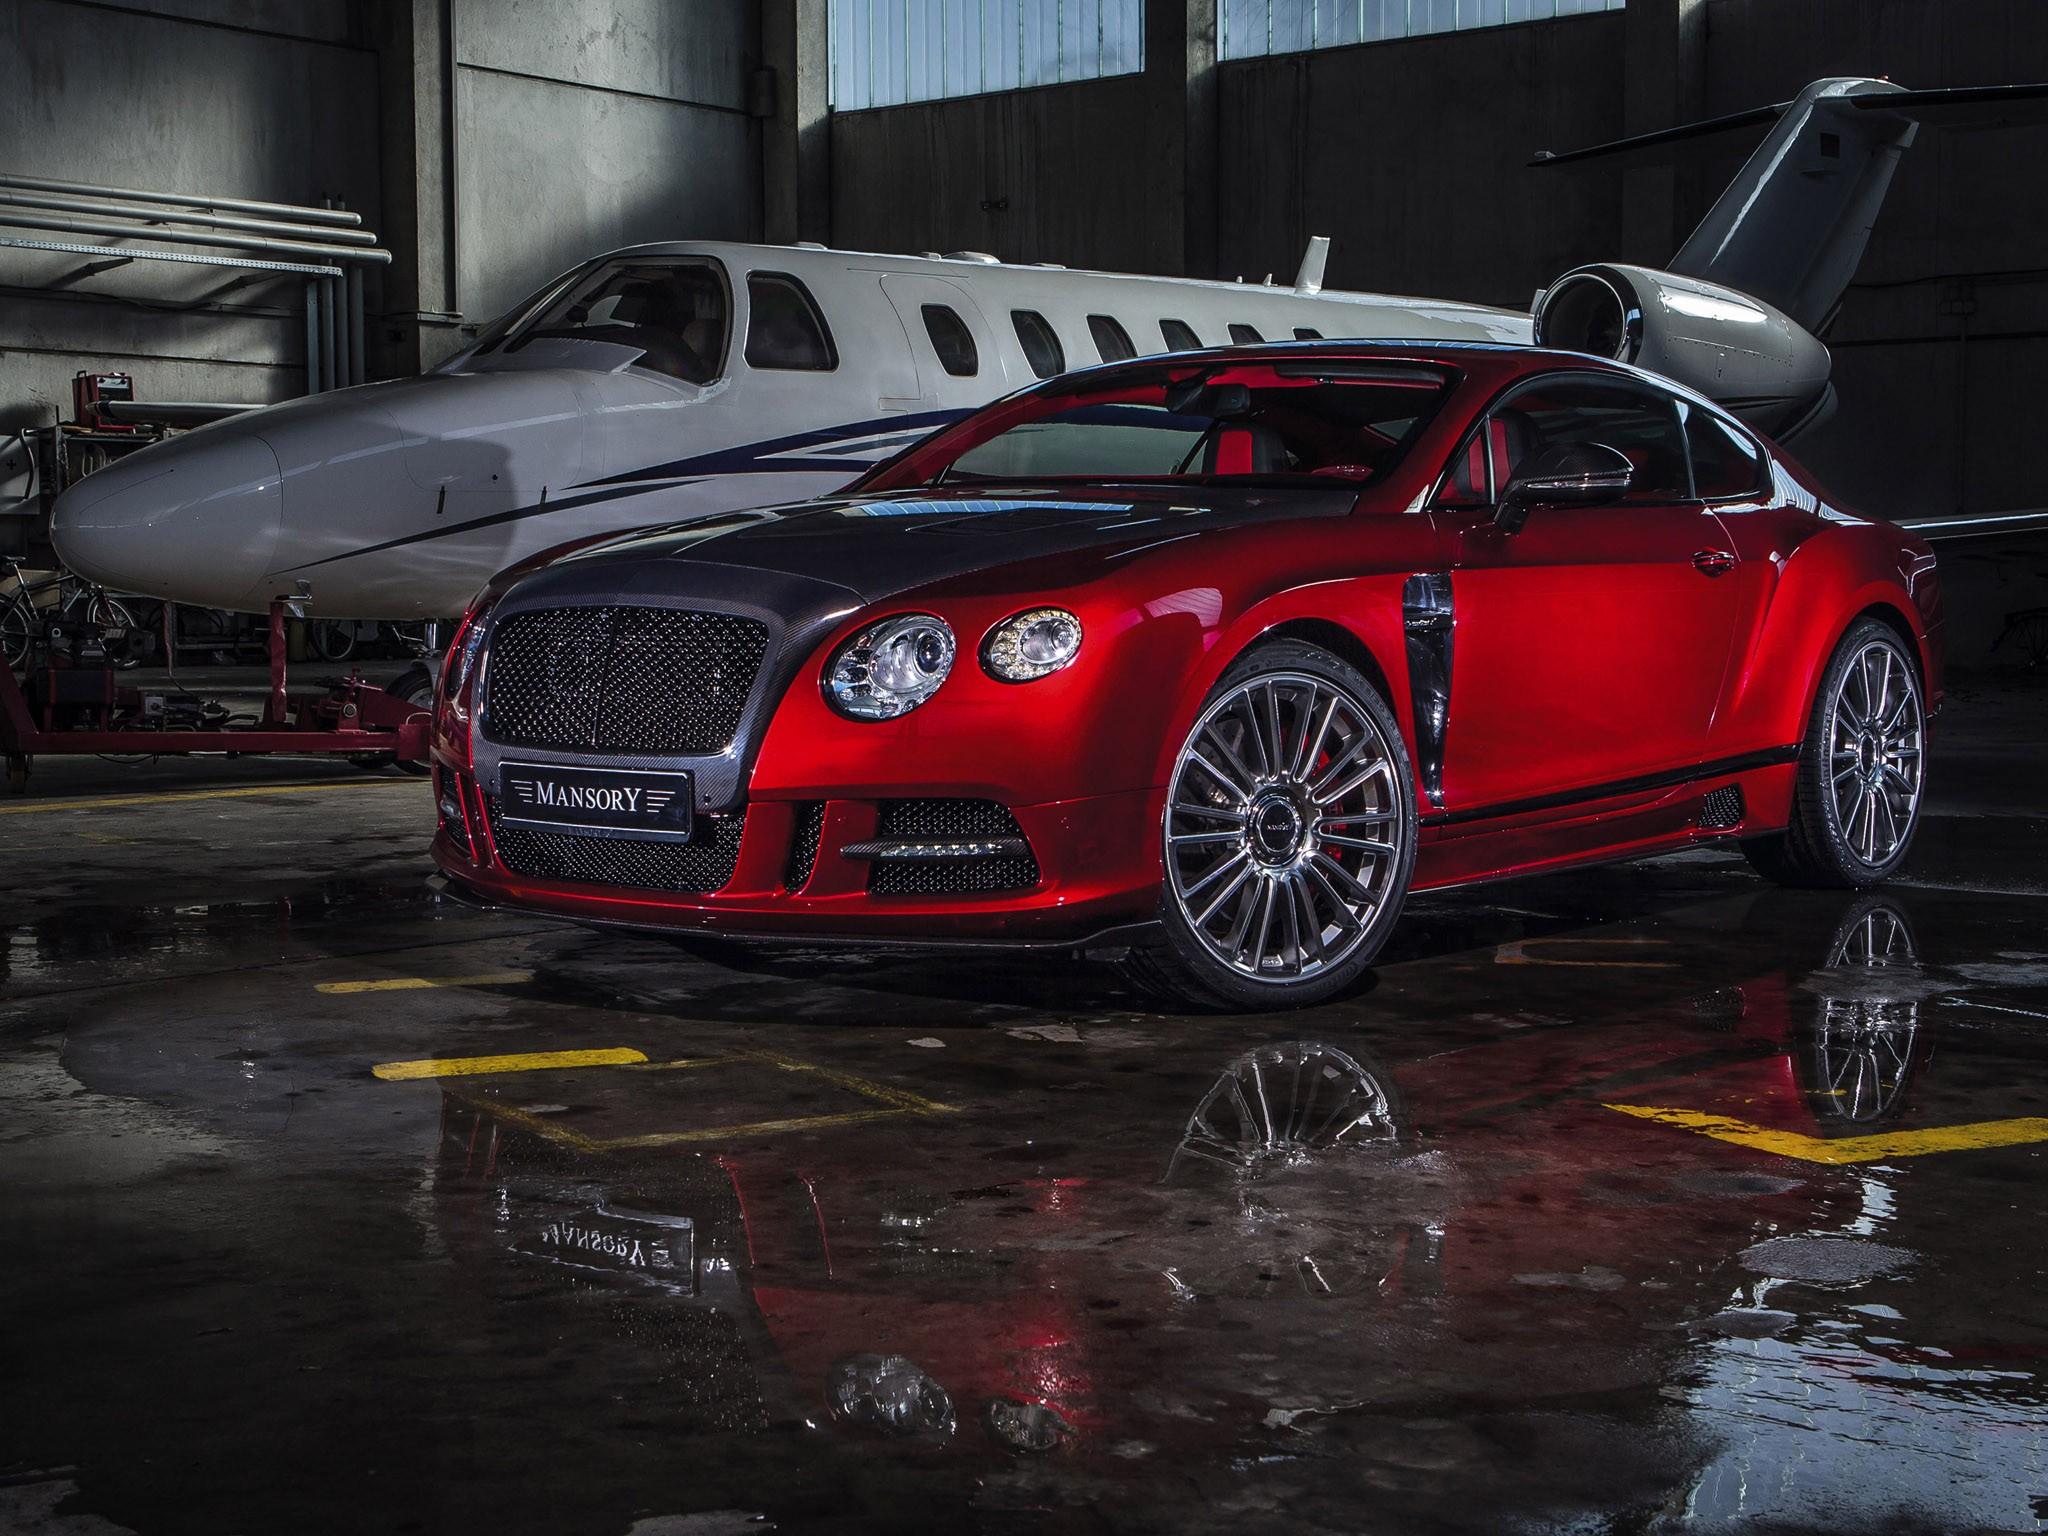 2013 Mansory - Bentley Continental GT Sanguis